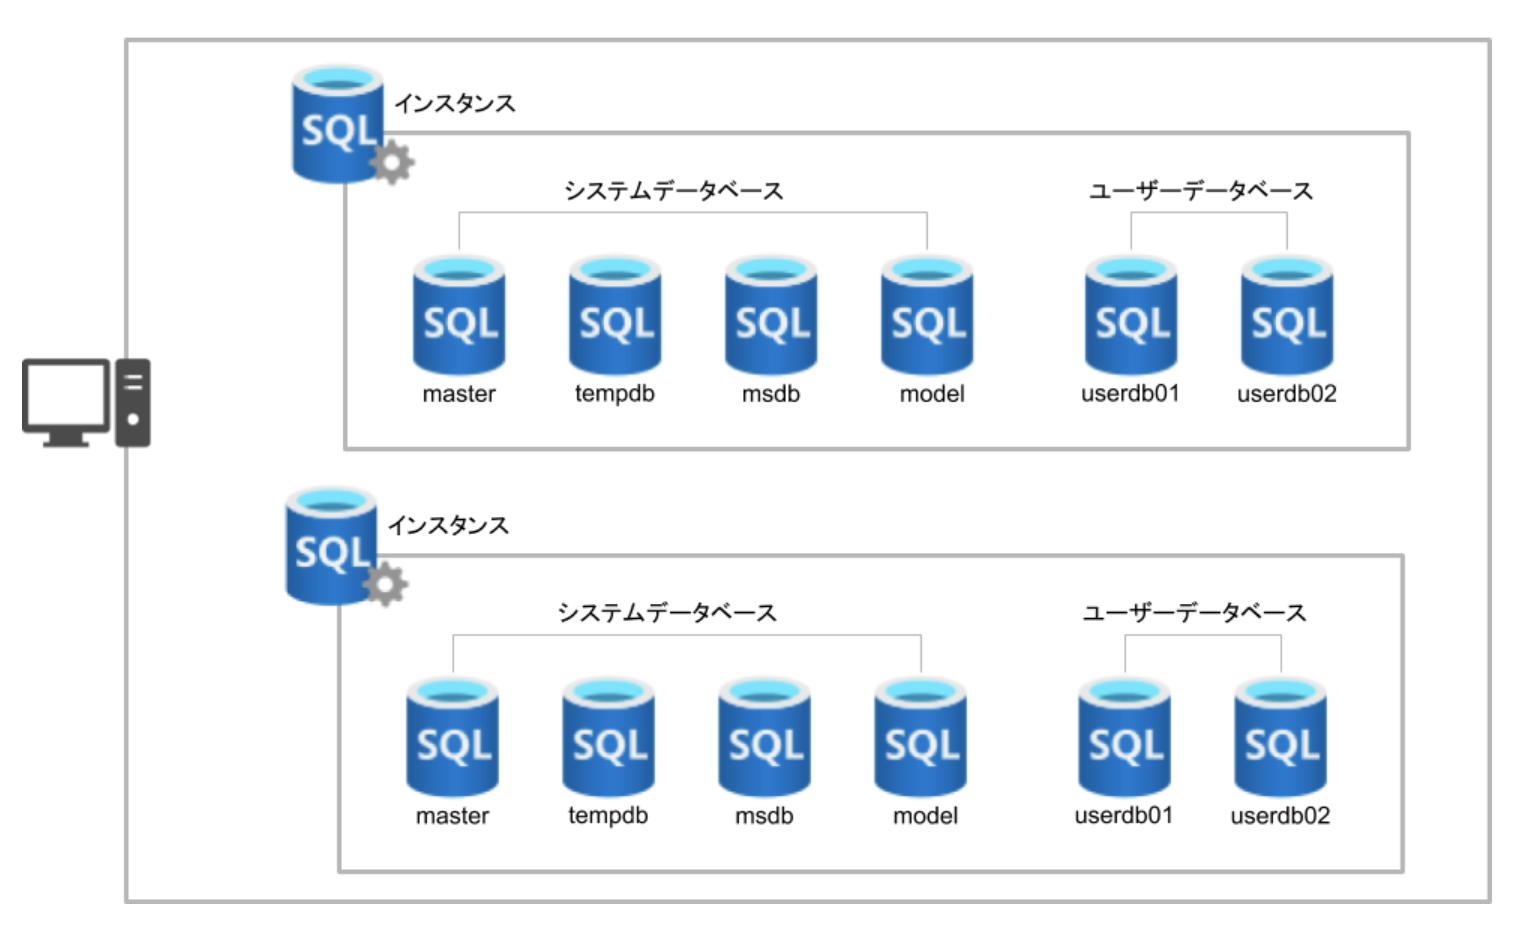 azure-sql-database-02-01